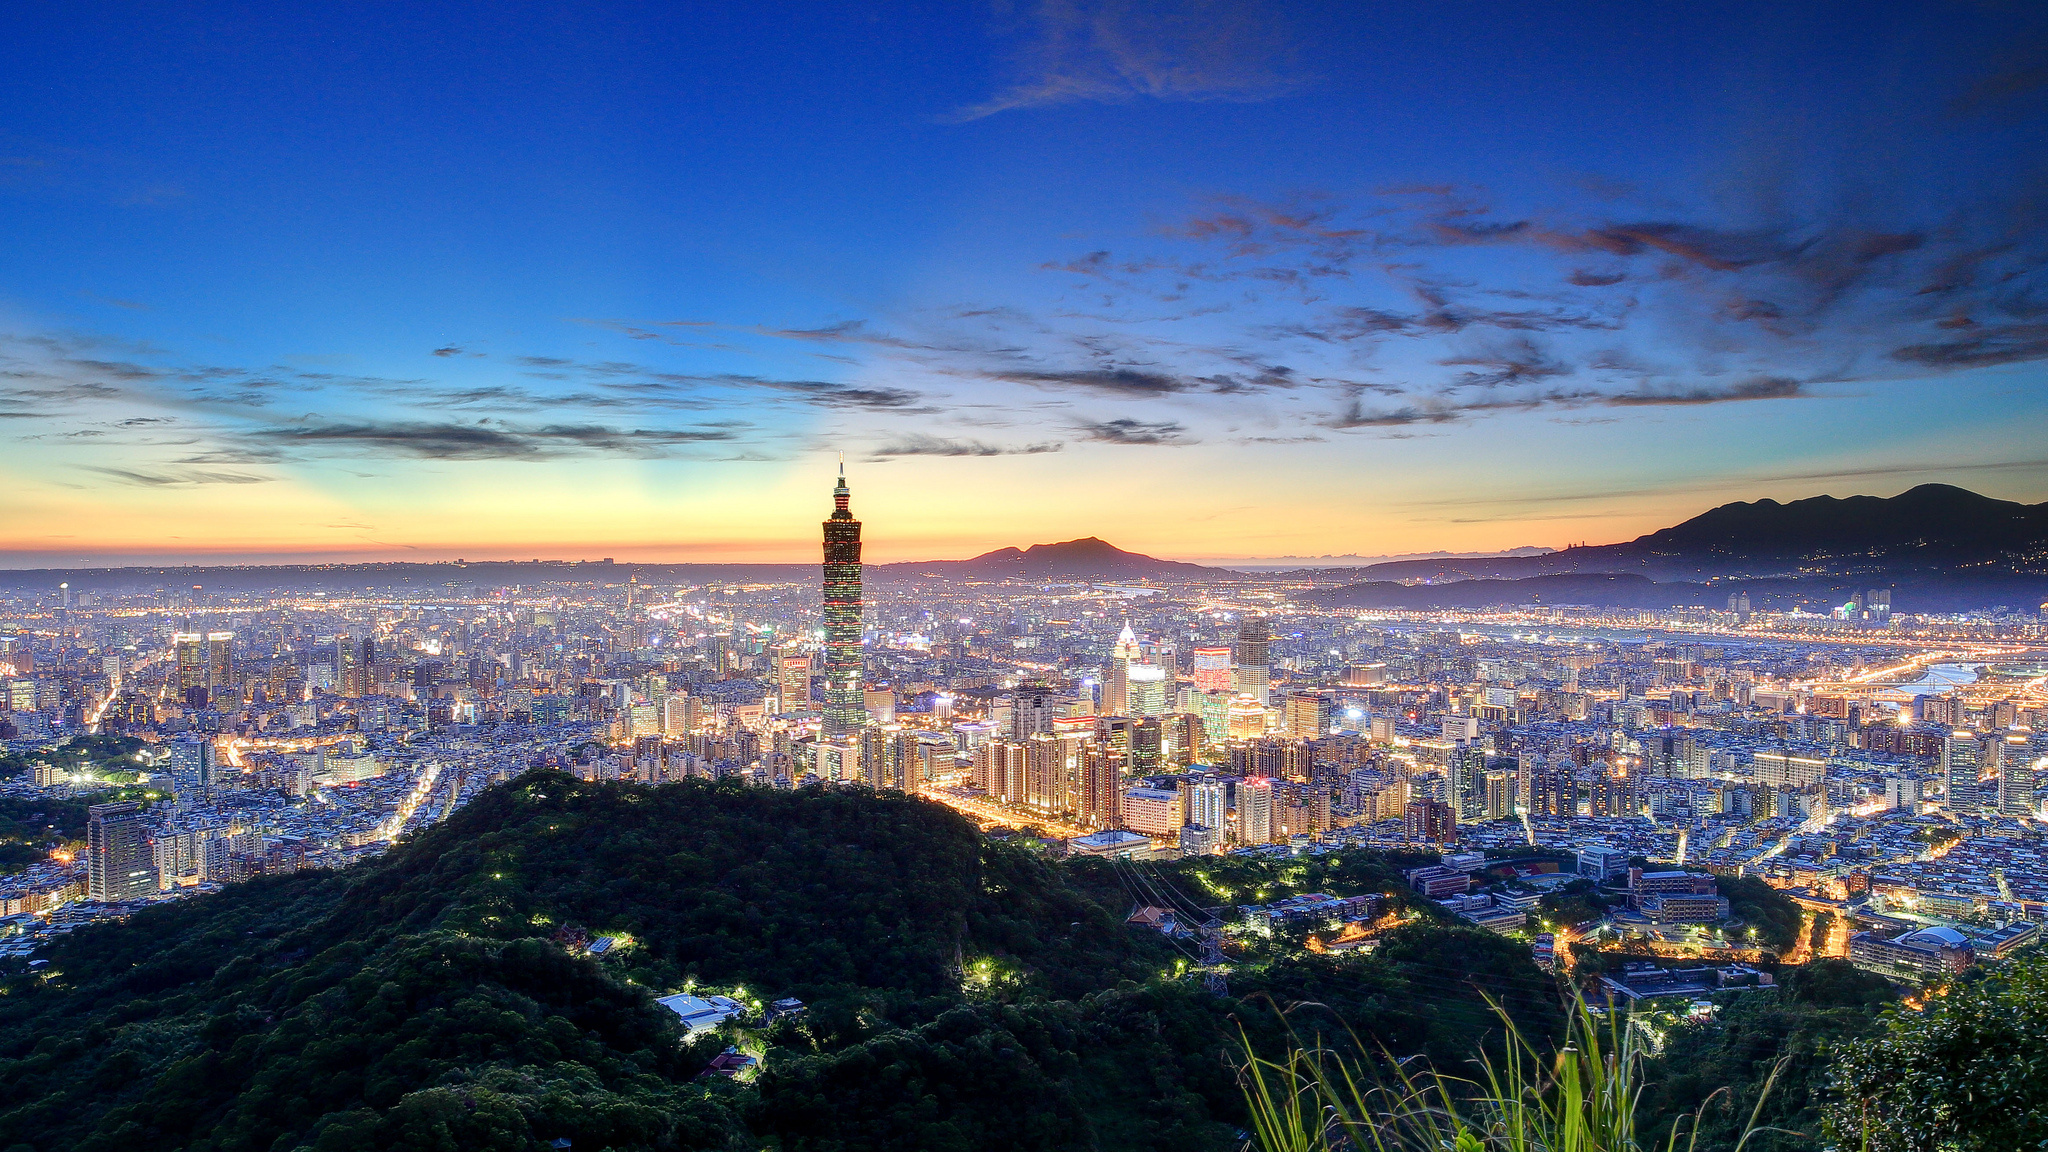 china taipei taiwan china night city skyline wallpaper | 2048x1152